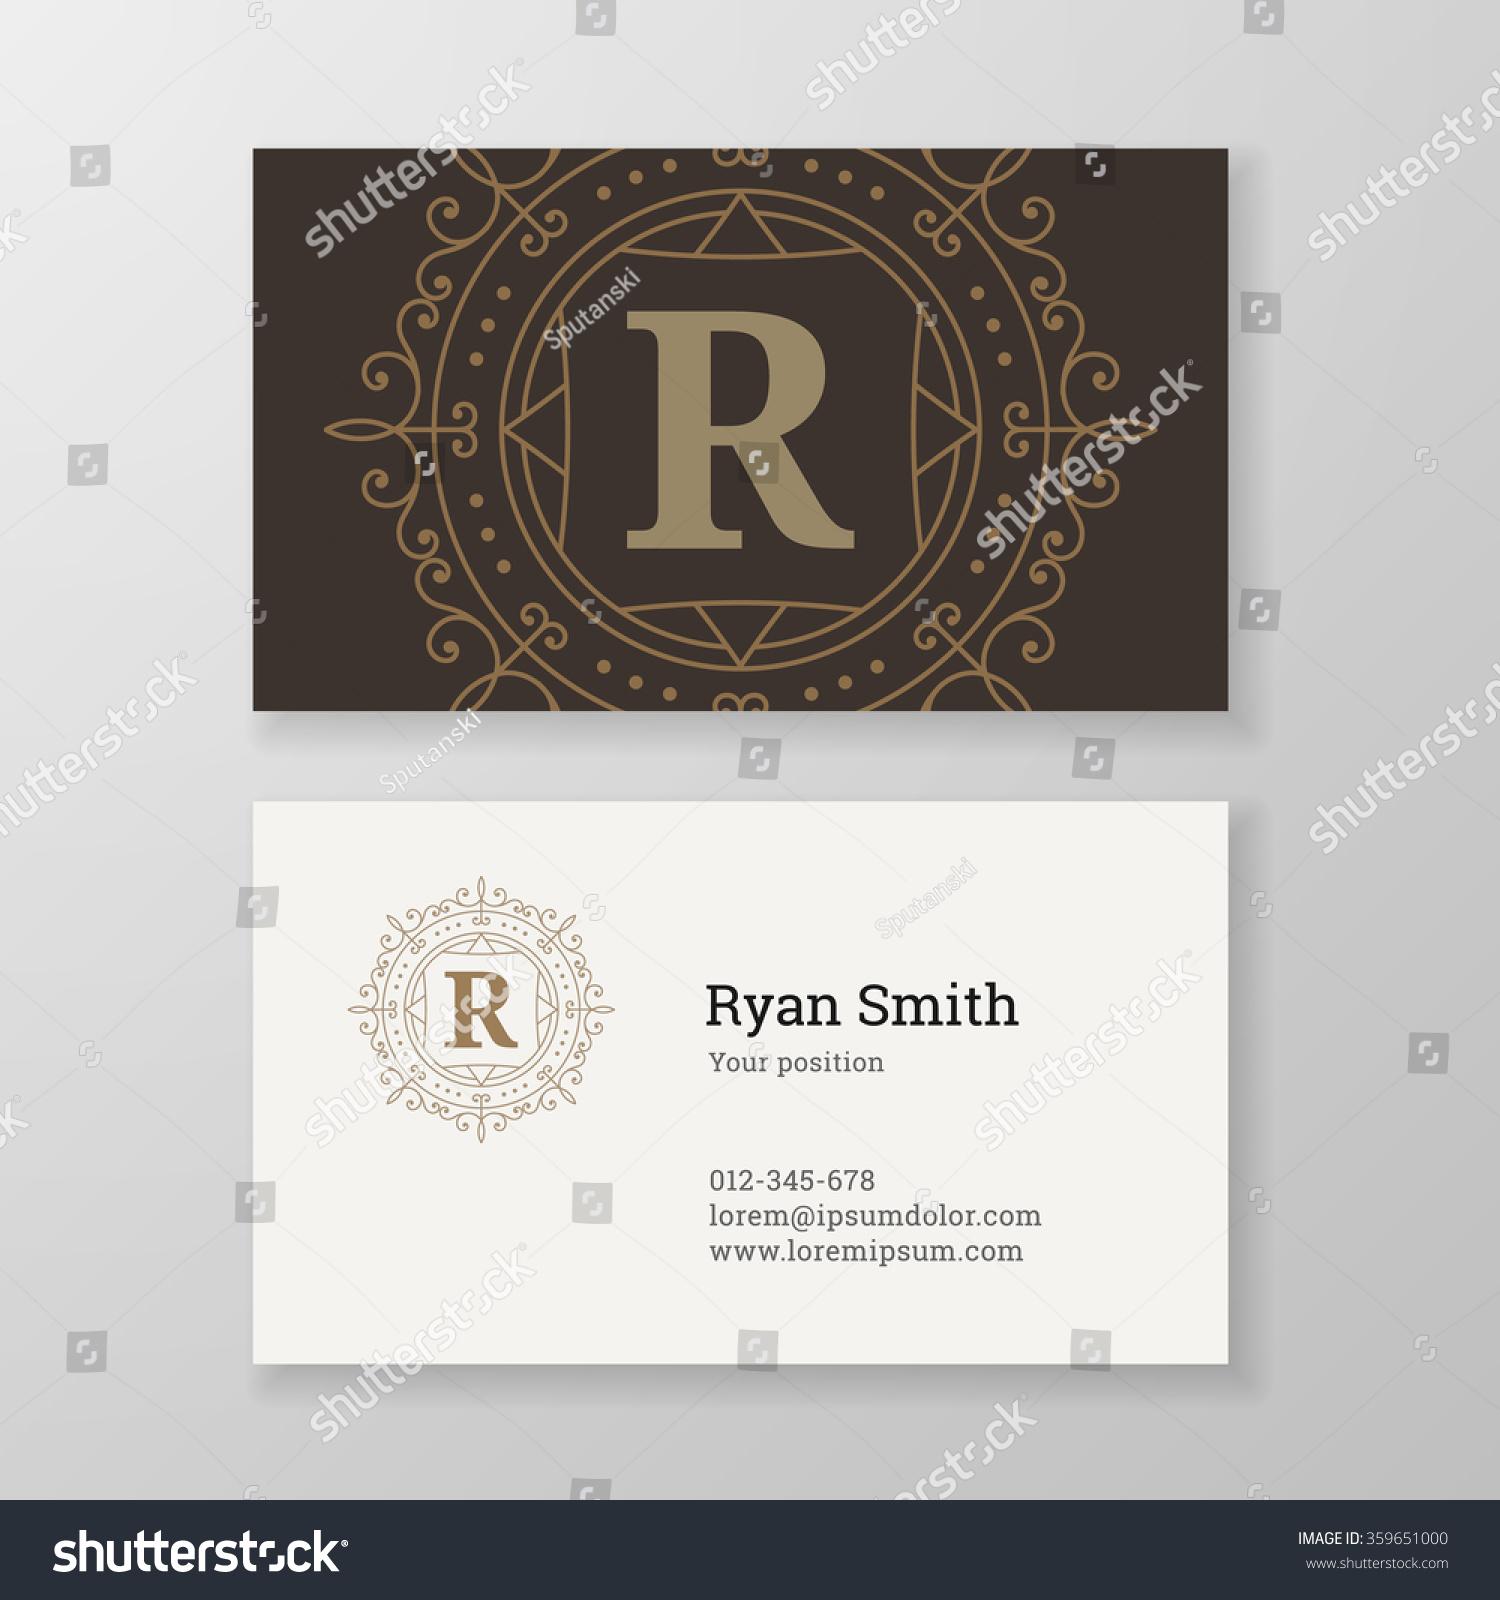 Business Card Monogram Emblem Letter R Stock Vector HD (Royalty Free ...